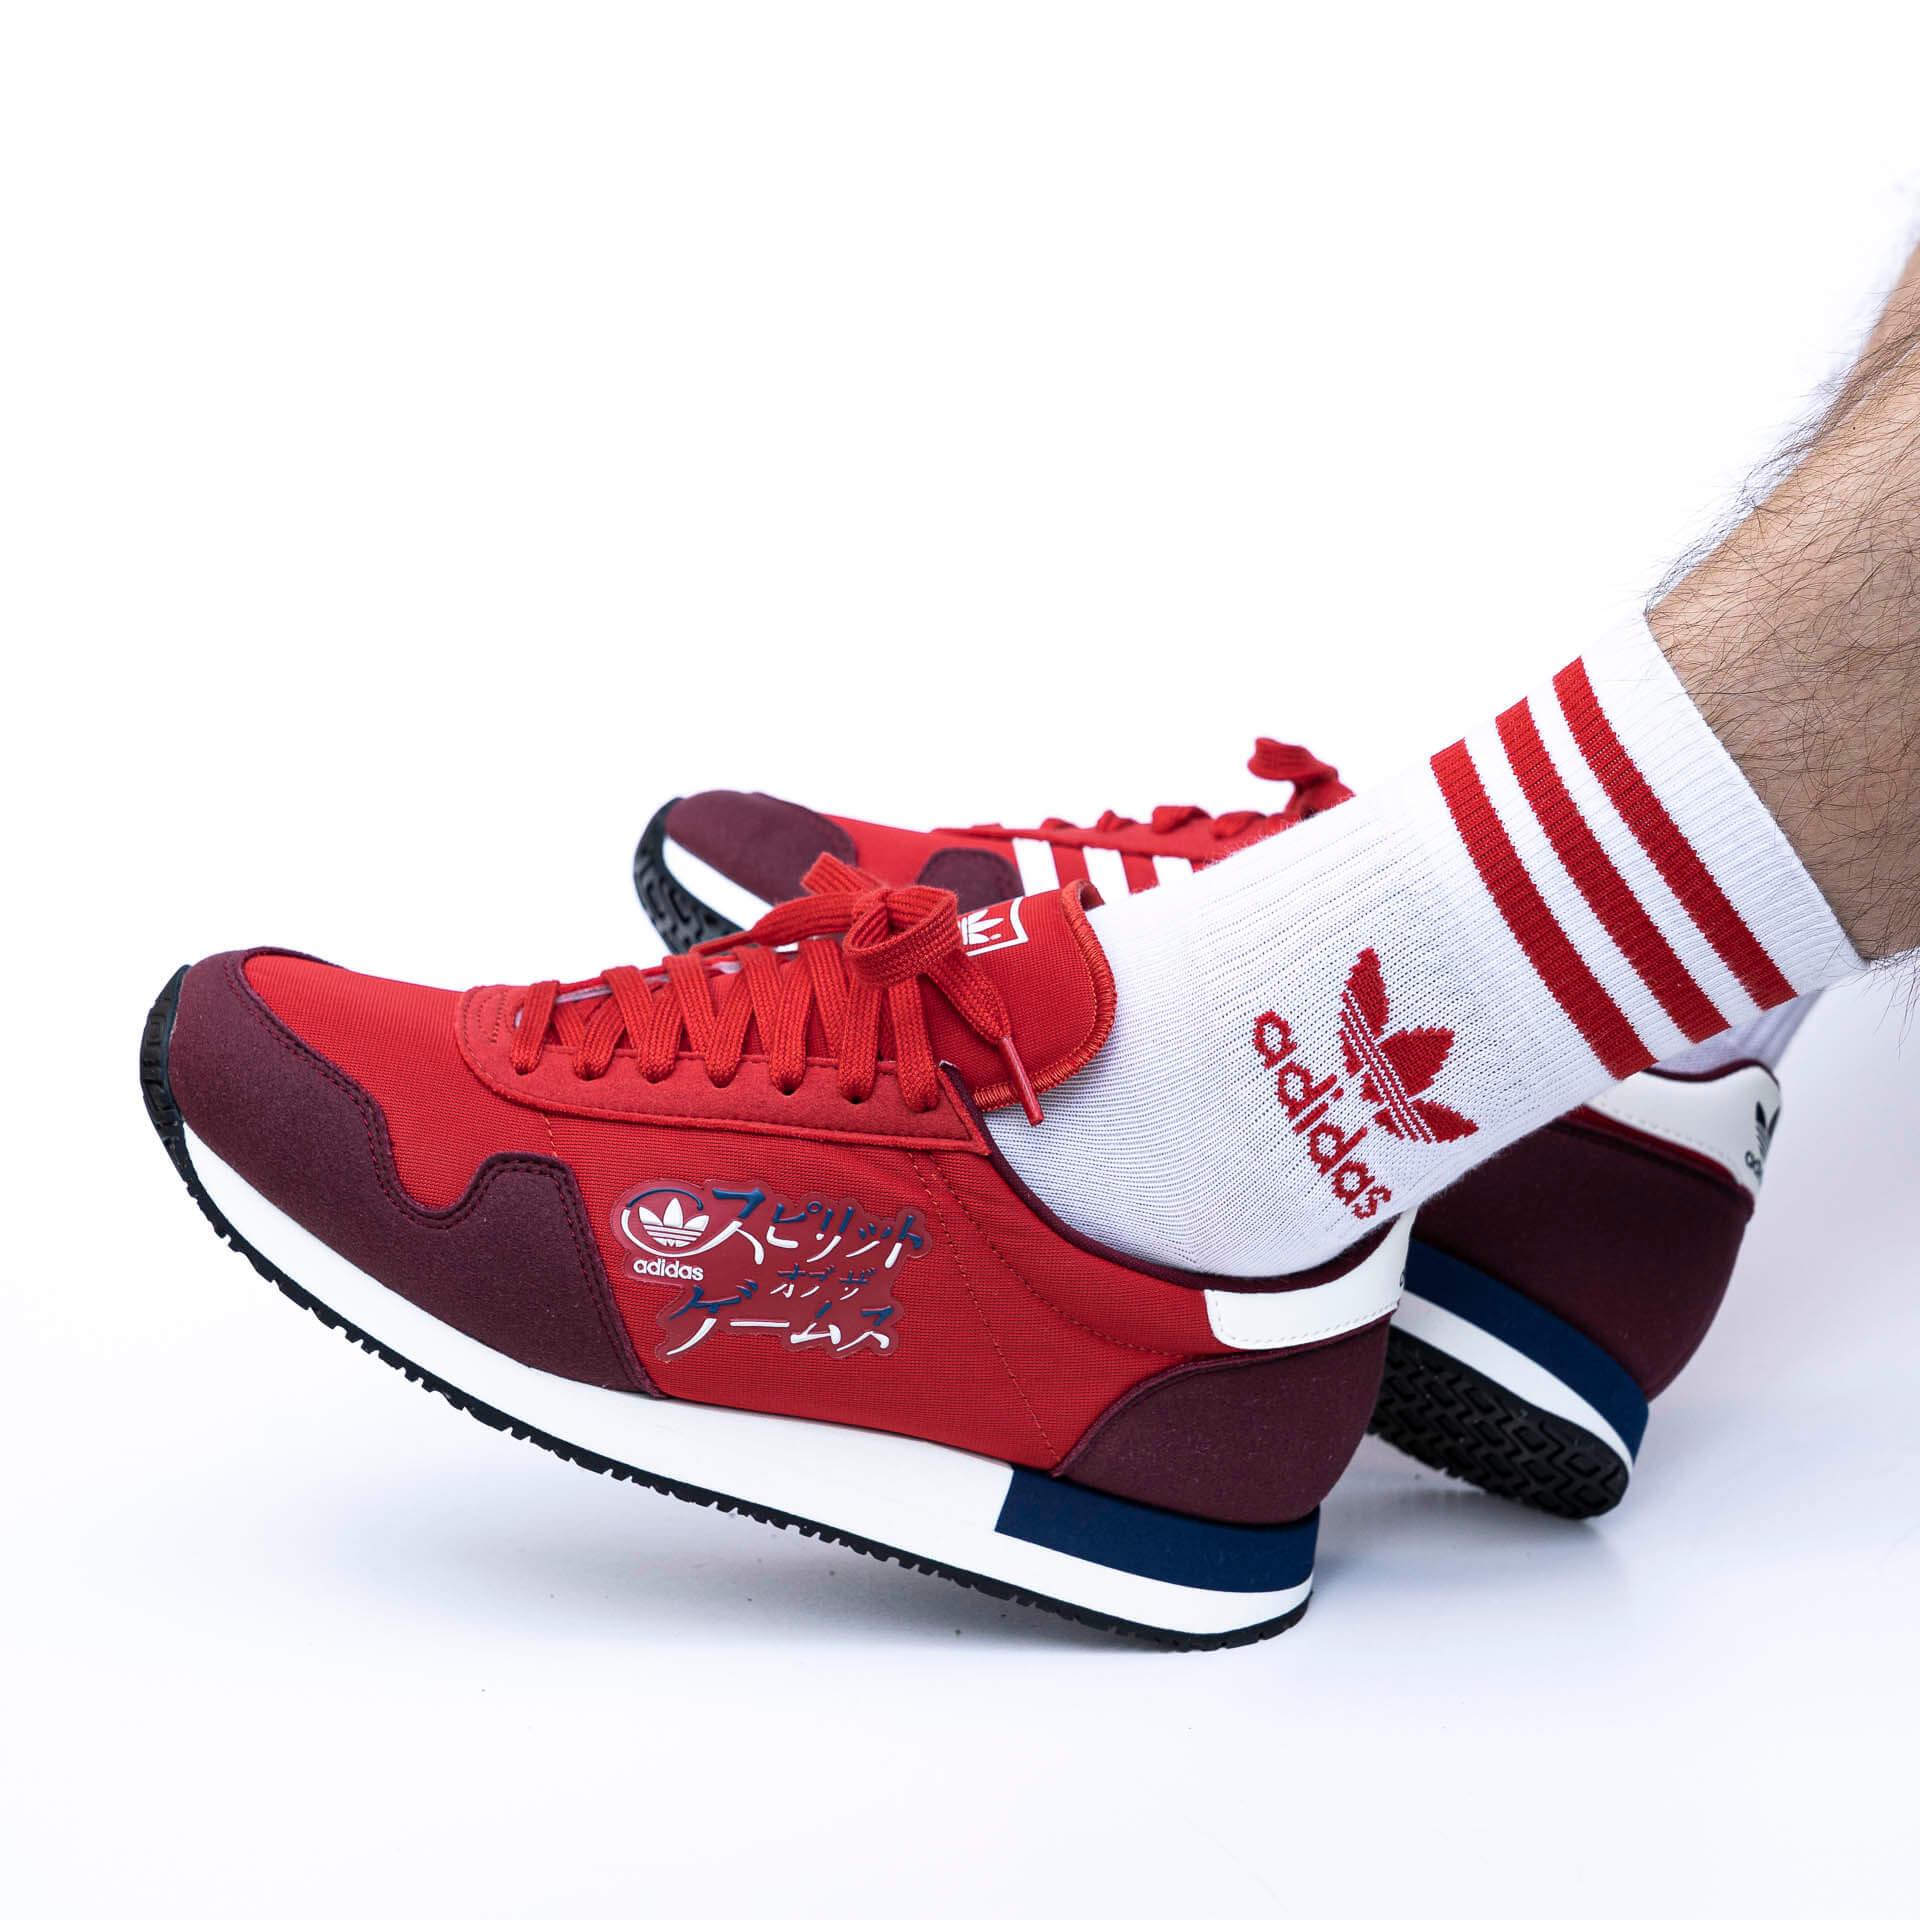 Adidas Spirit of the Games